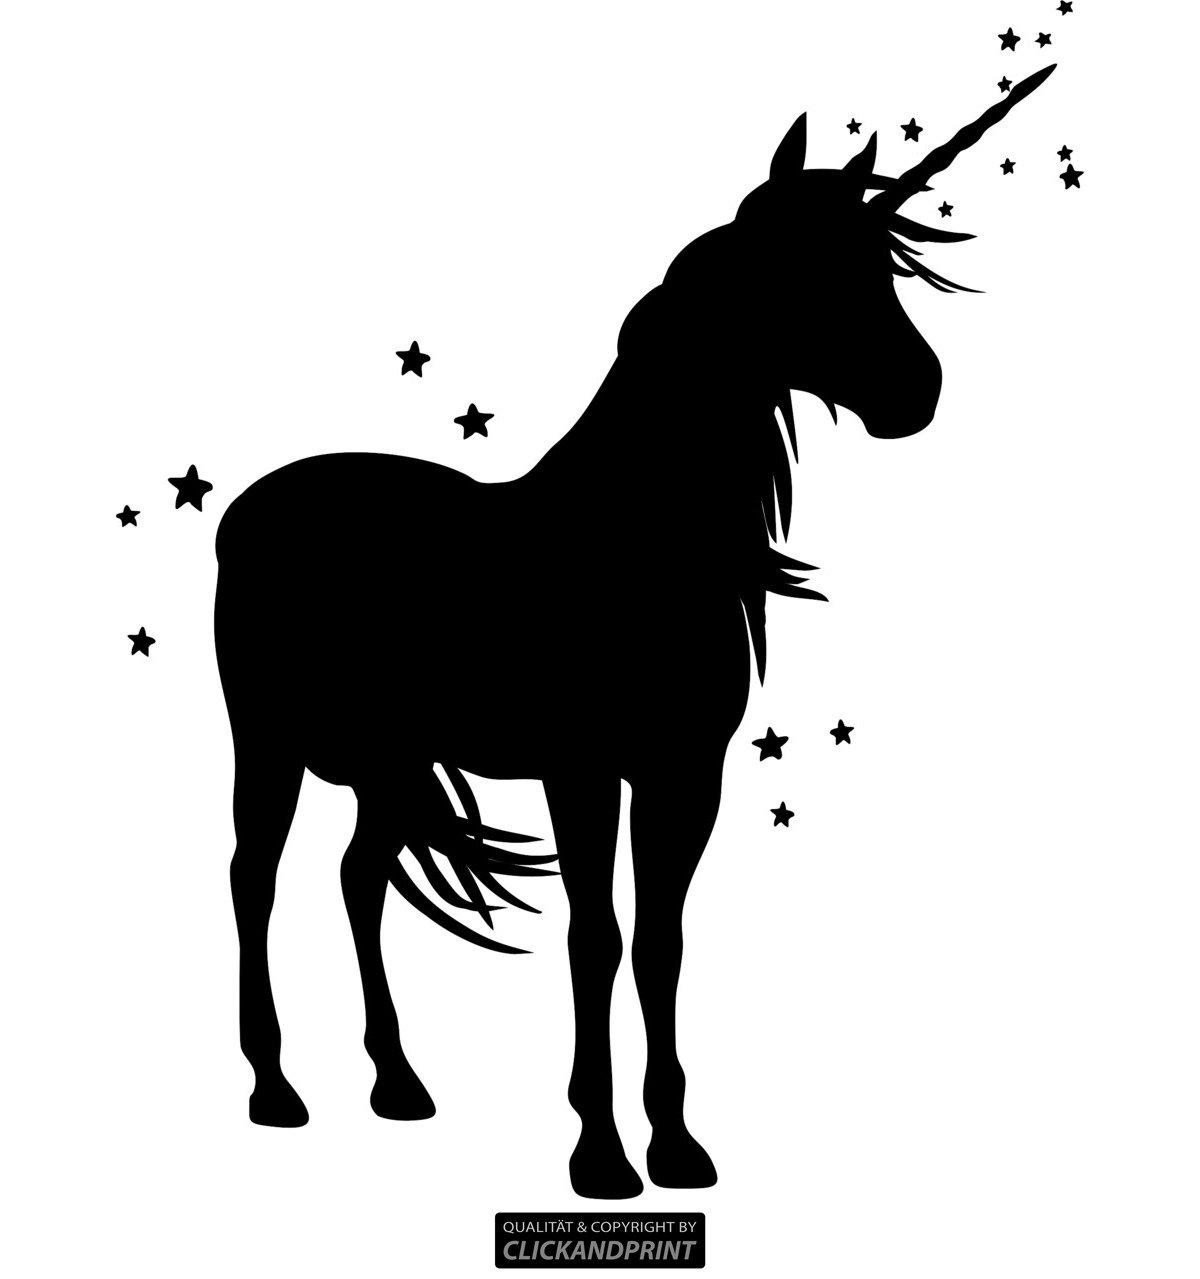 CLICKANDPRINT Aufkleber » Einhorn mit Sternen, 120x96,9cm, Schwarz • Wandtattoo   Wandaufkleber   Wandsticker   Wanddeko   Vinyl